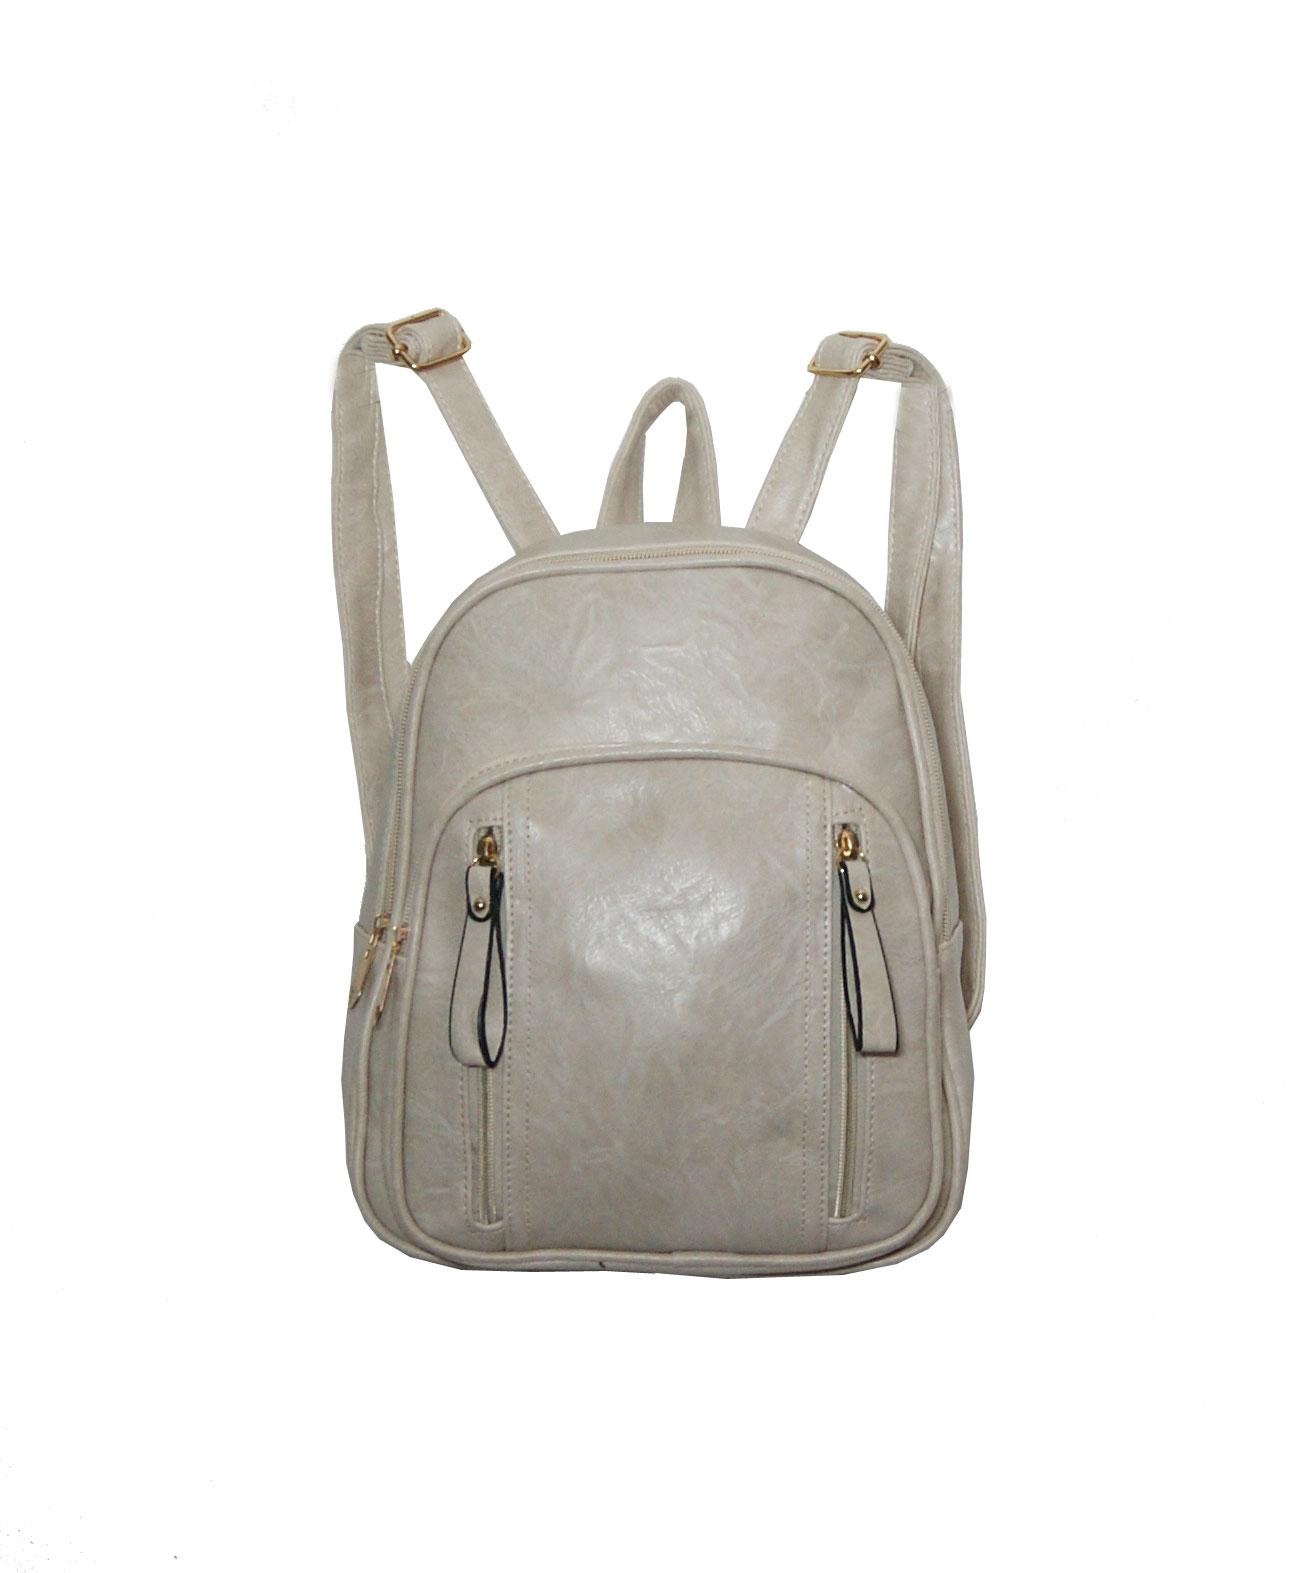 Backpack No 836 - Μπεζ (Silvio 836)